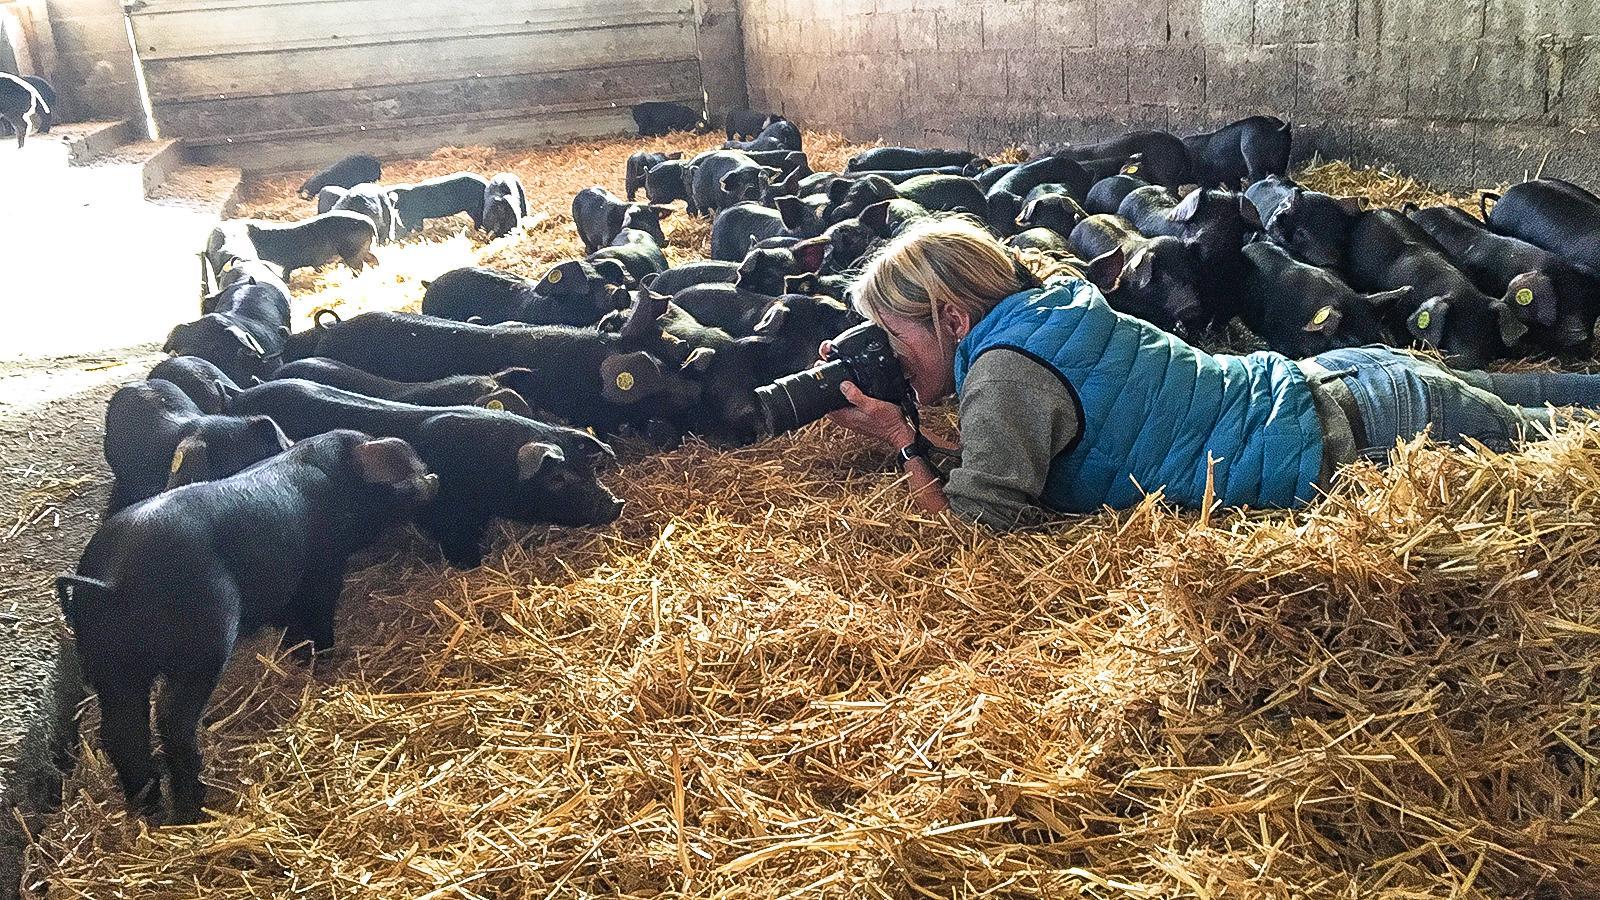 Porc noir de Bigorre: Hilke Maunder fotografiert die Ferkel.